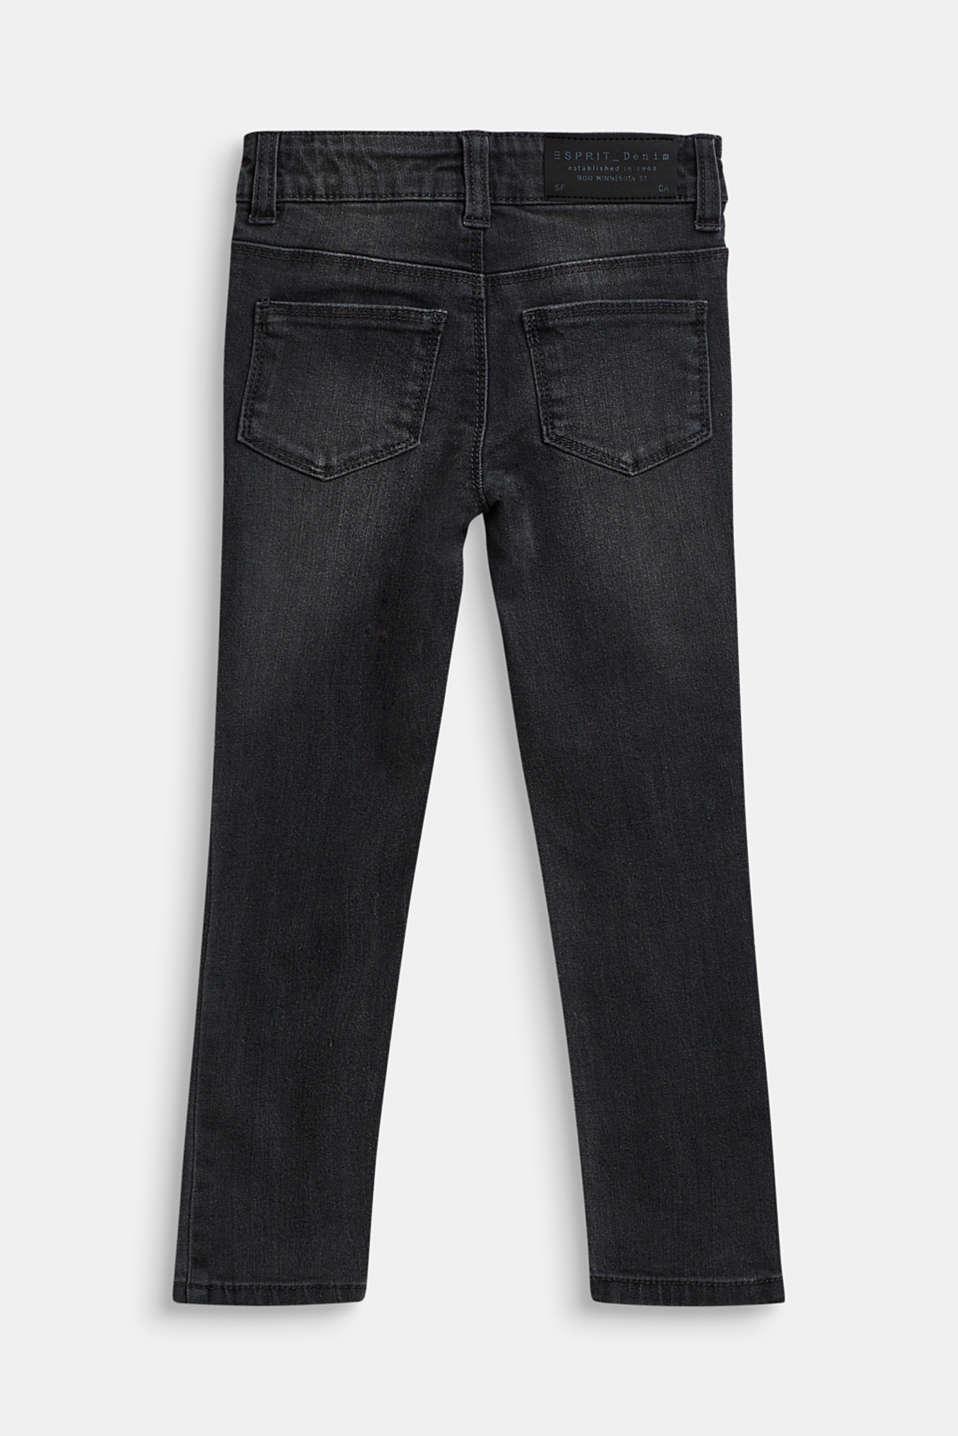 Stretch jeans with an adjustable waist, LIGHT GREY DEN, detail image number 1